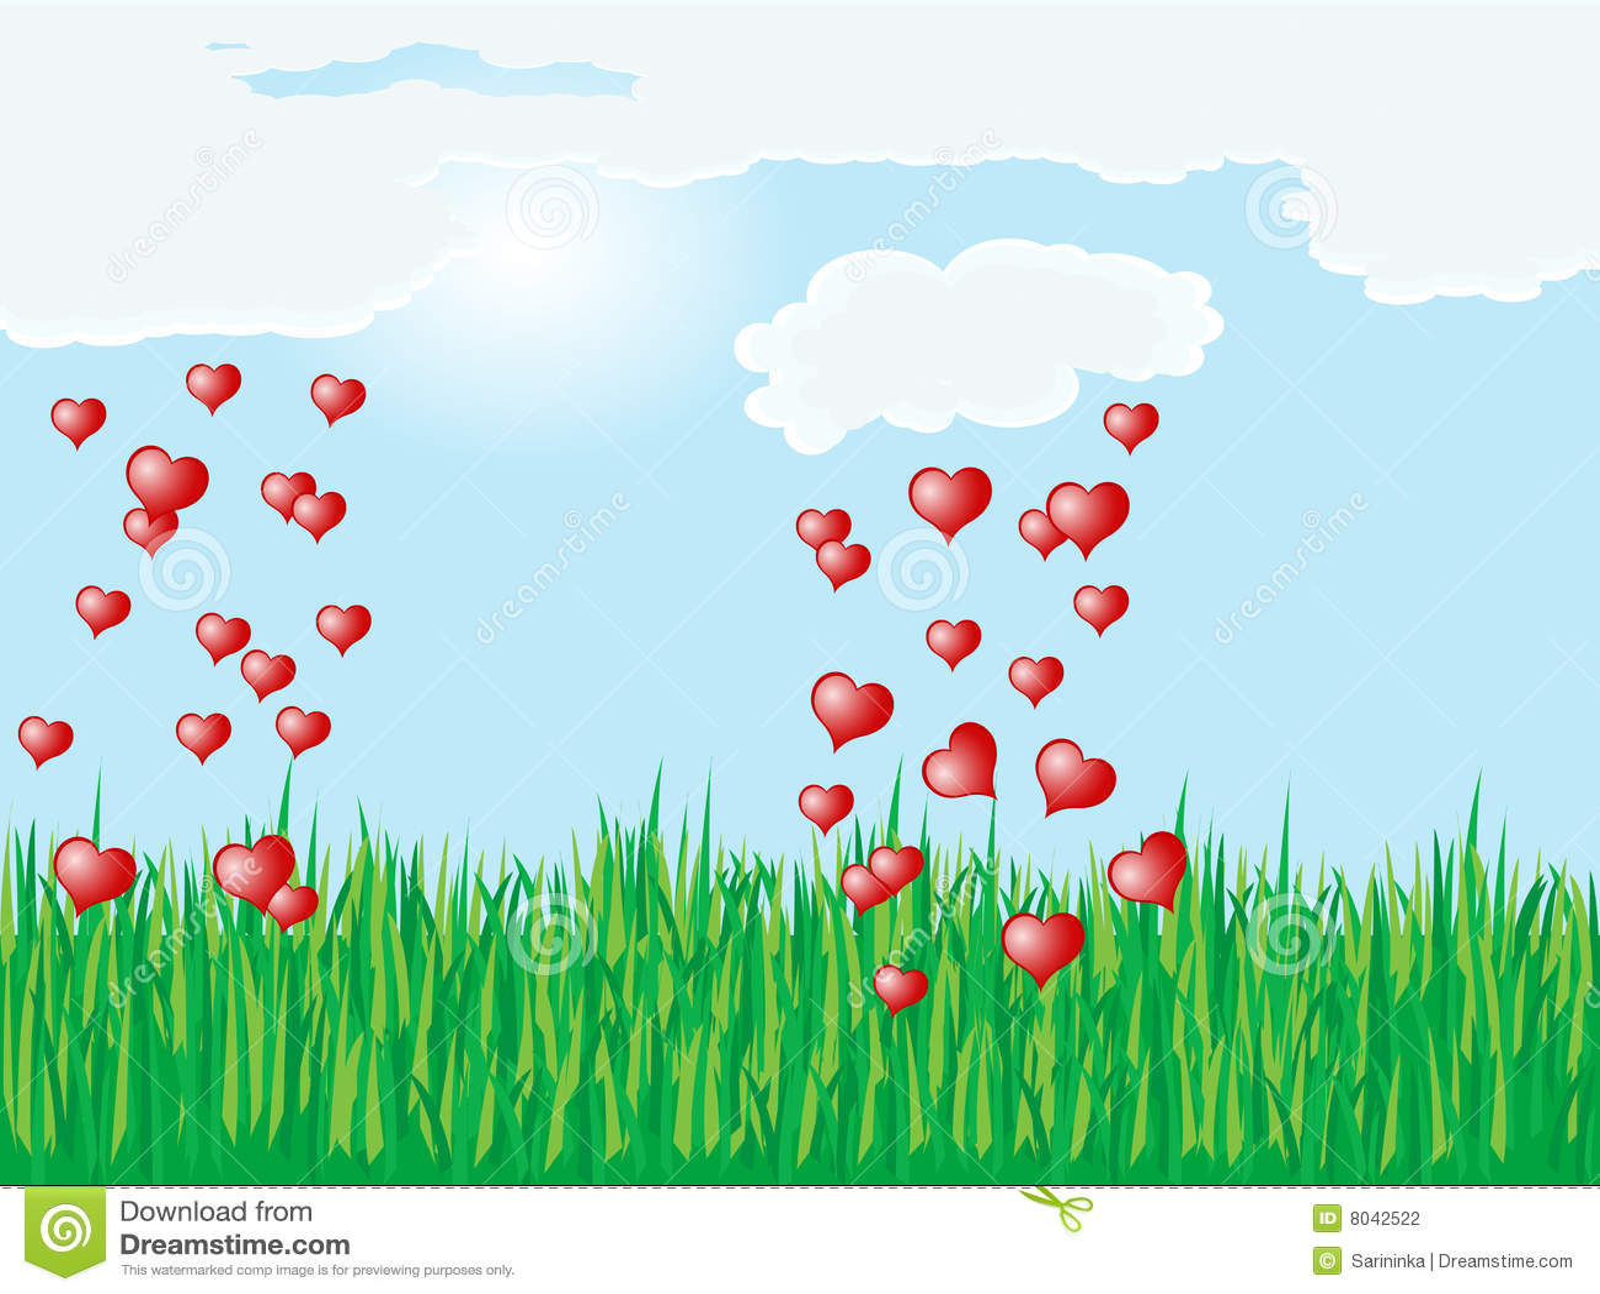 Heart Rain Stock Photography - Image: 8042522